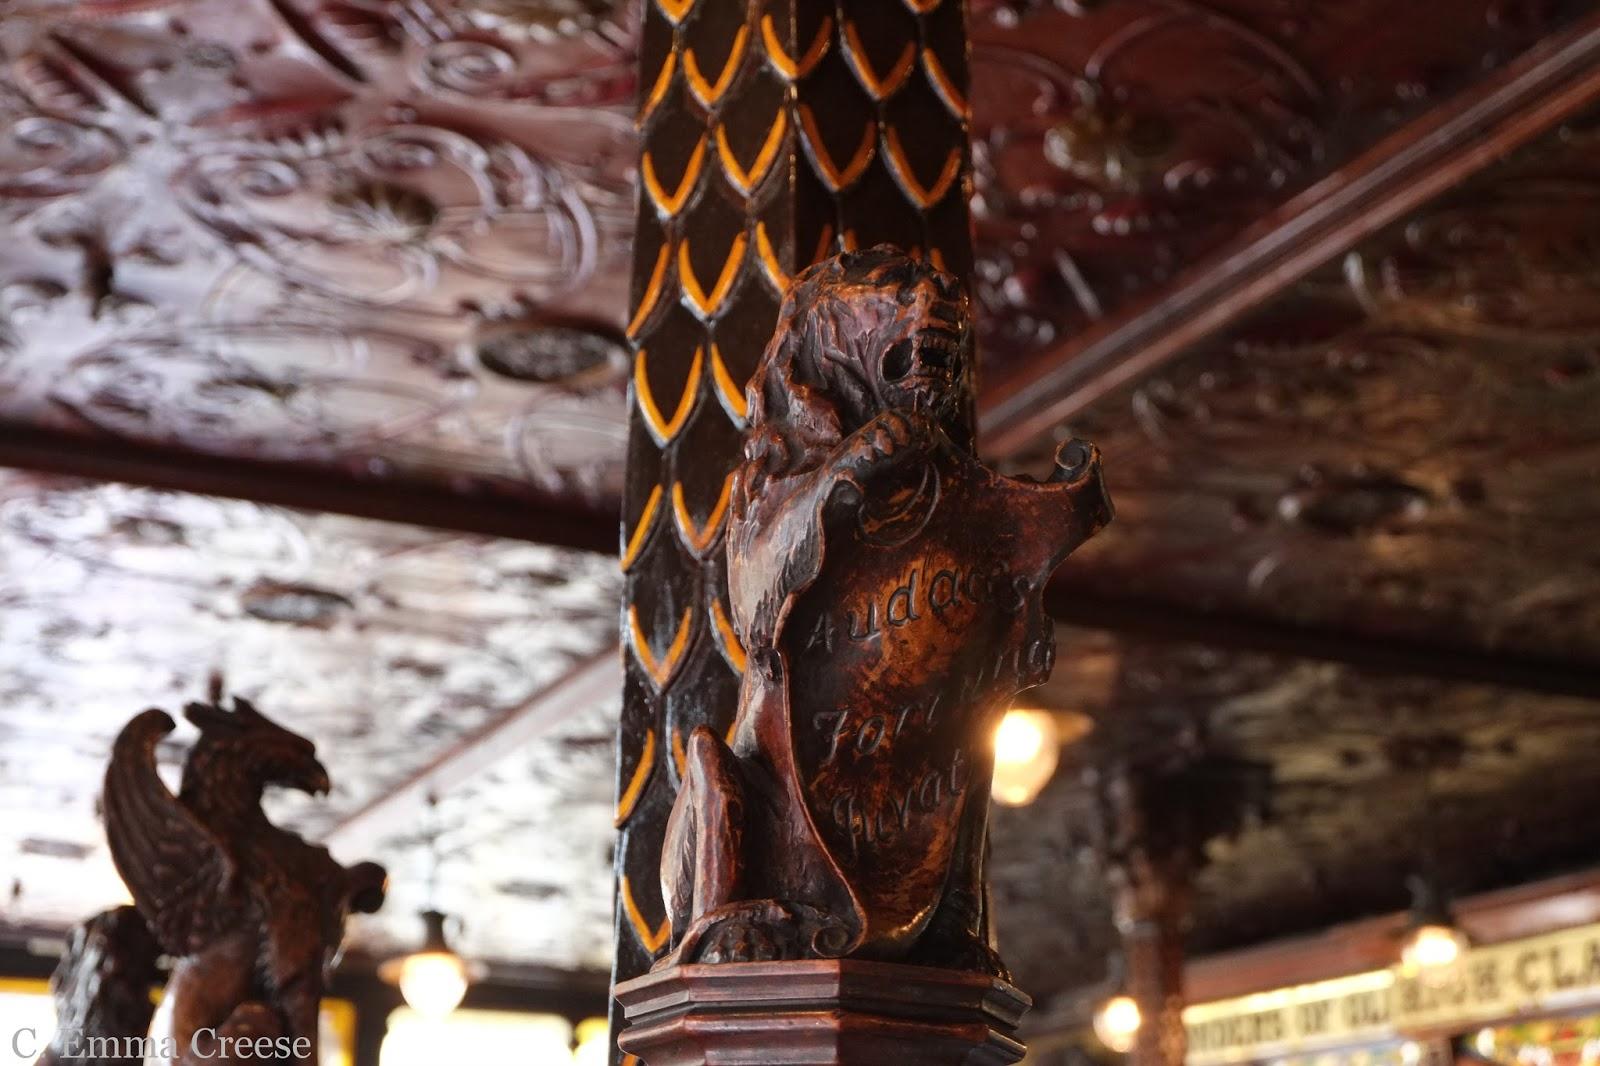 Crown Pub Belfast Northern Ireland Adventures of a London Kiwi